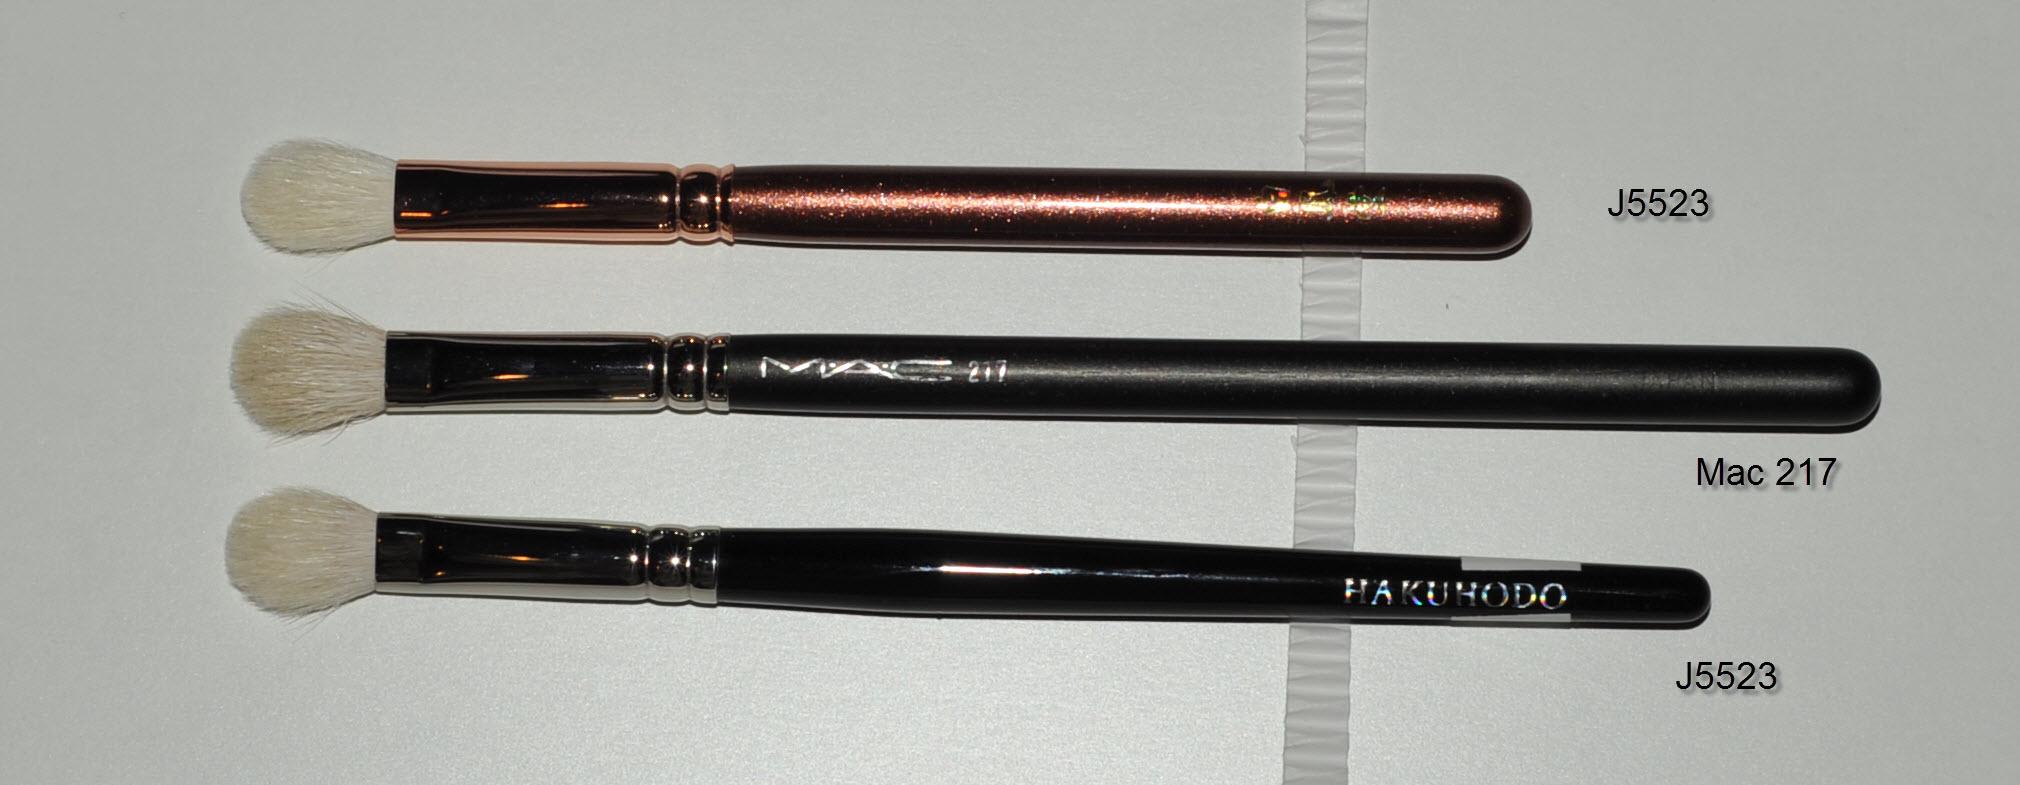 j5523